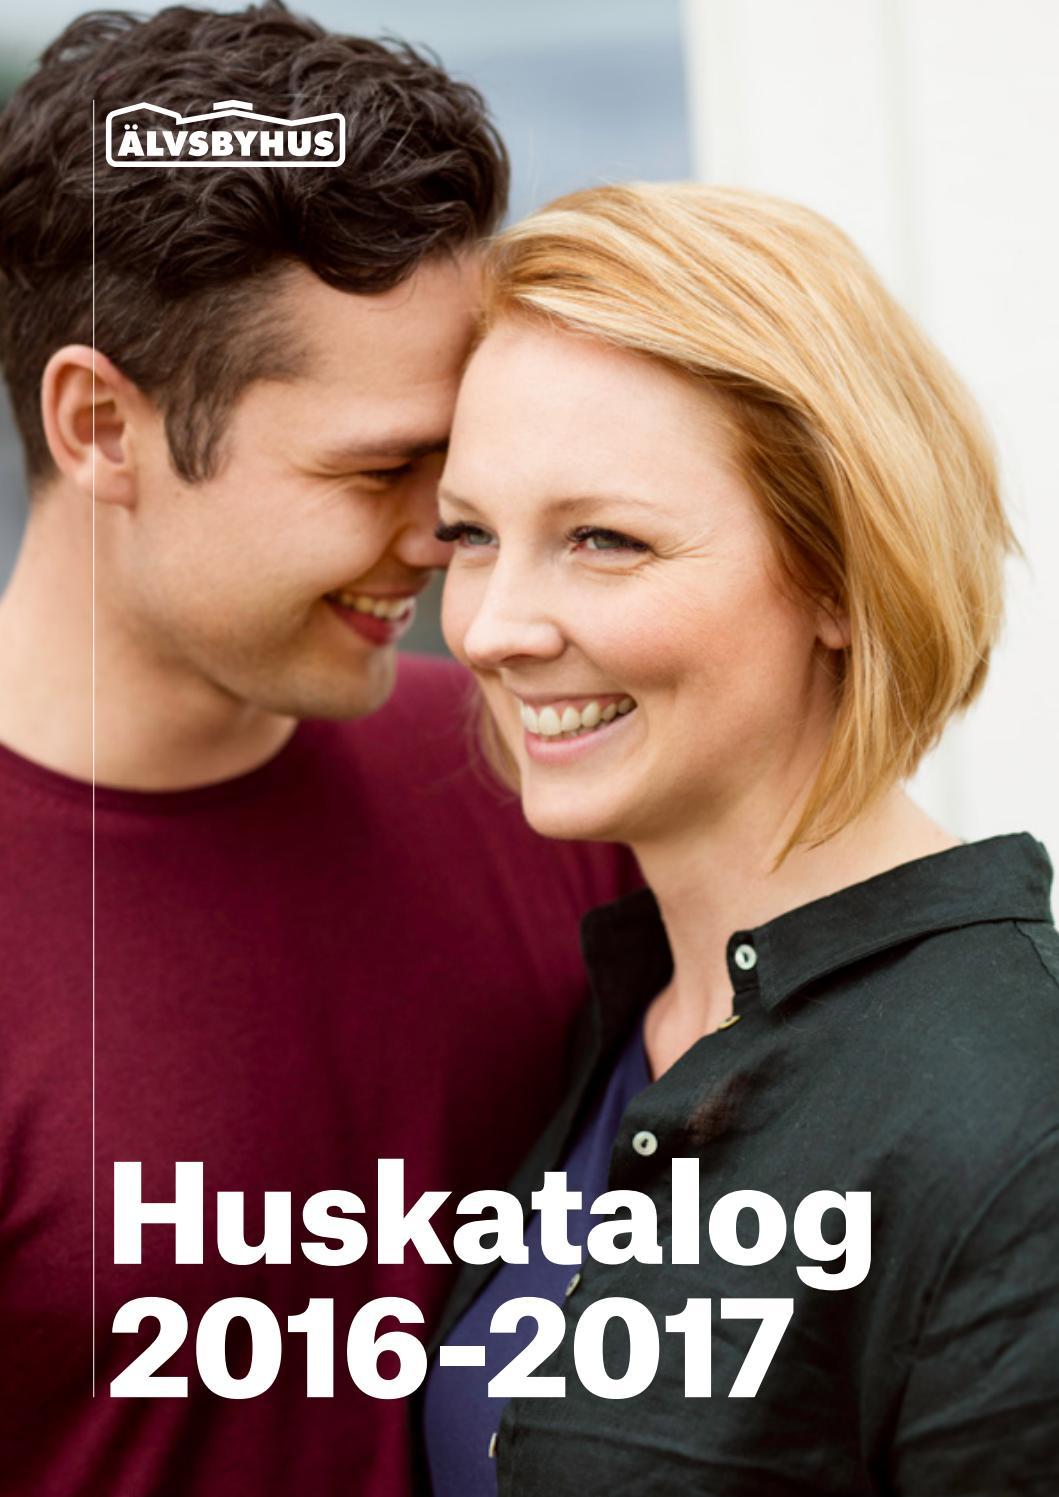 Älvsbyhus huskatalog 2016 2017 by Älvsbyhus   issuu